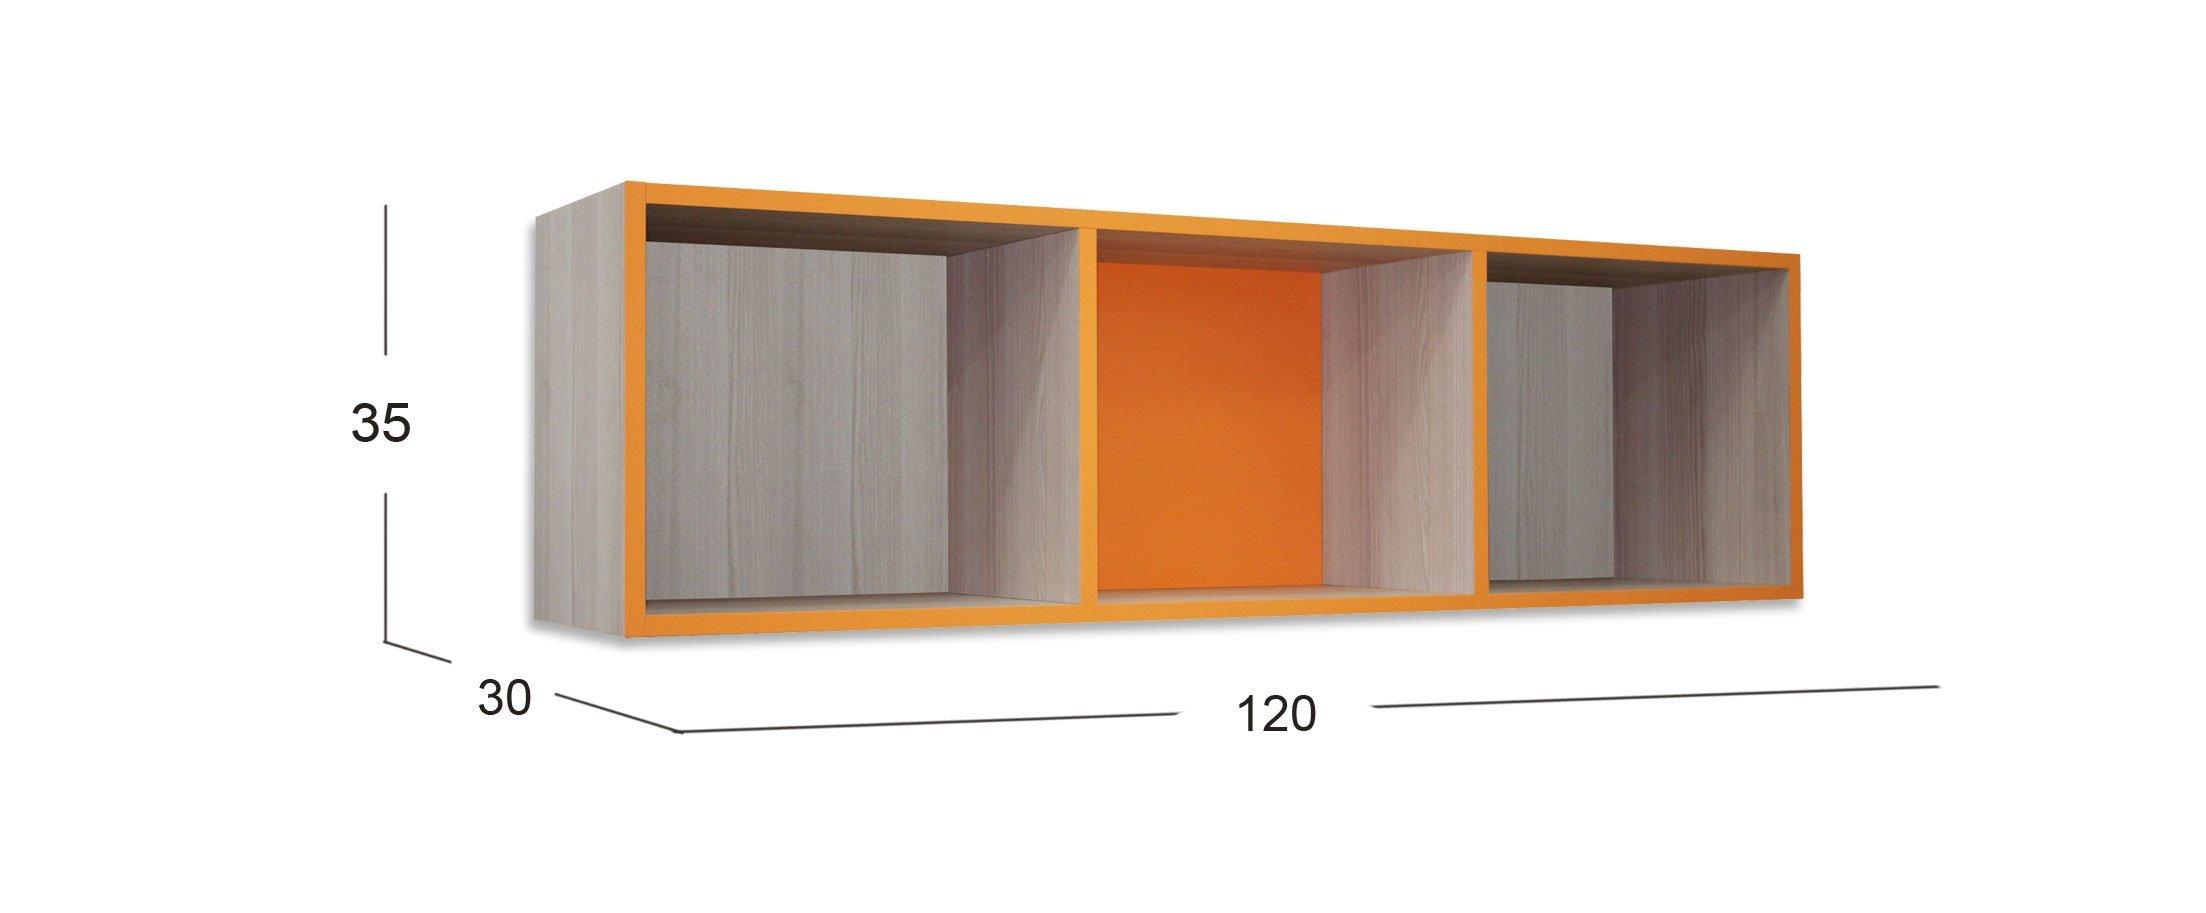 Полка для книг Скейт-3 Модель 507